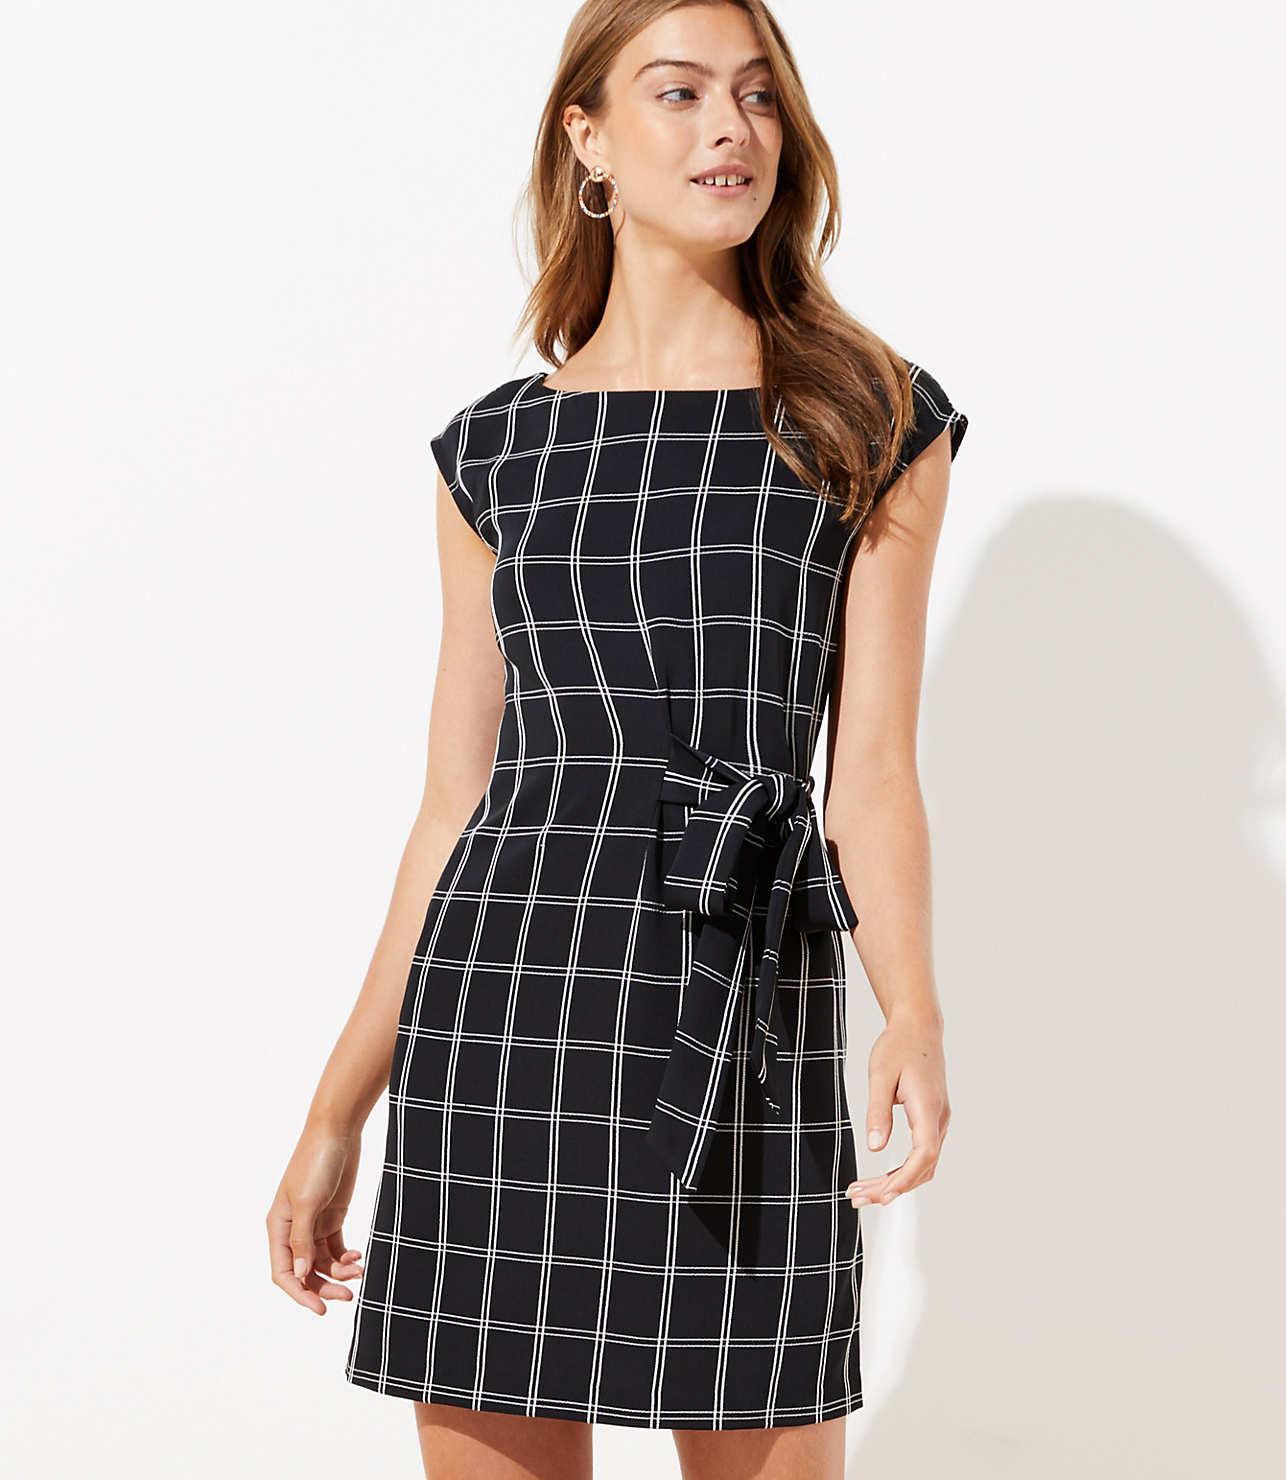 OL气质路线LOFT限时大促!打折区低至3折+所有裙子只要$49.5!